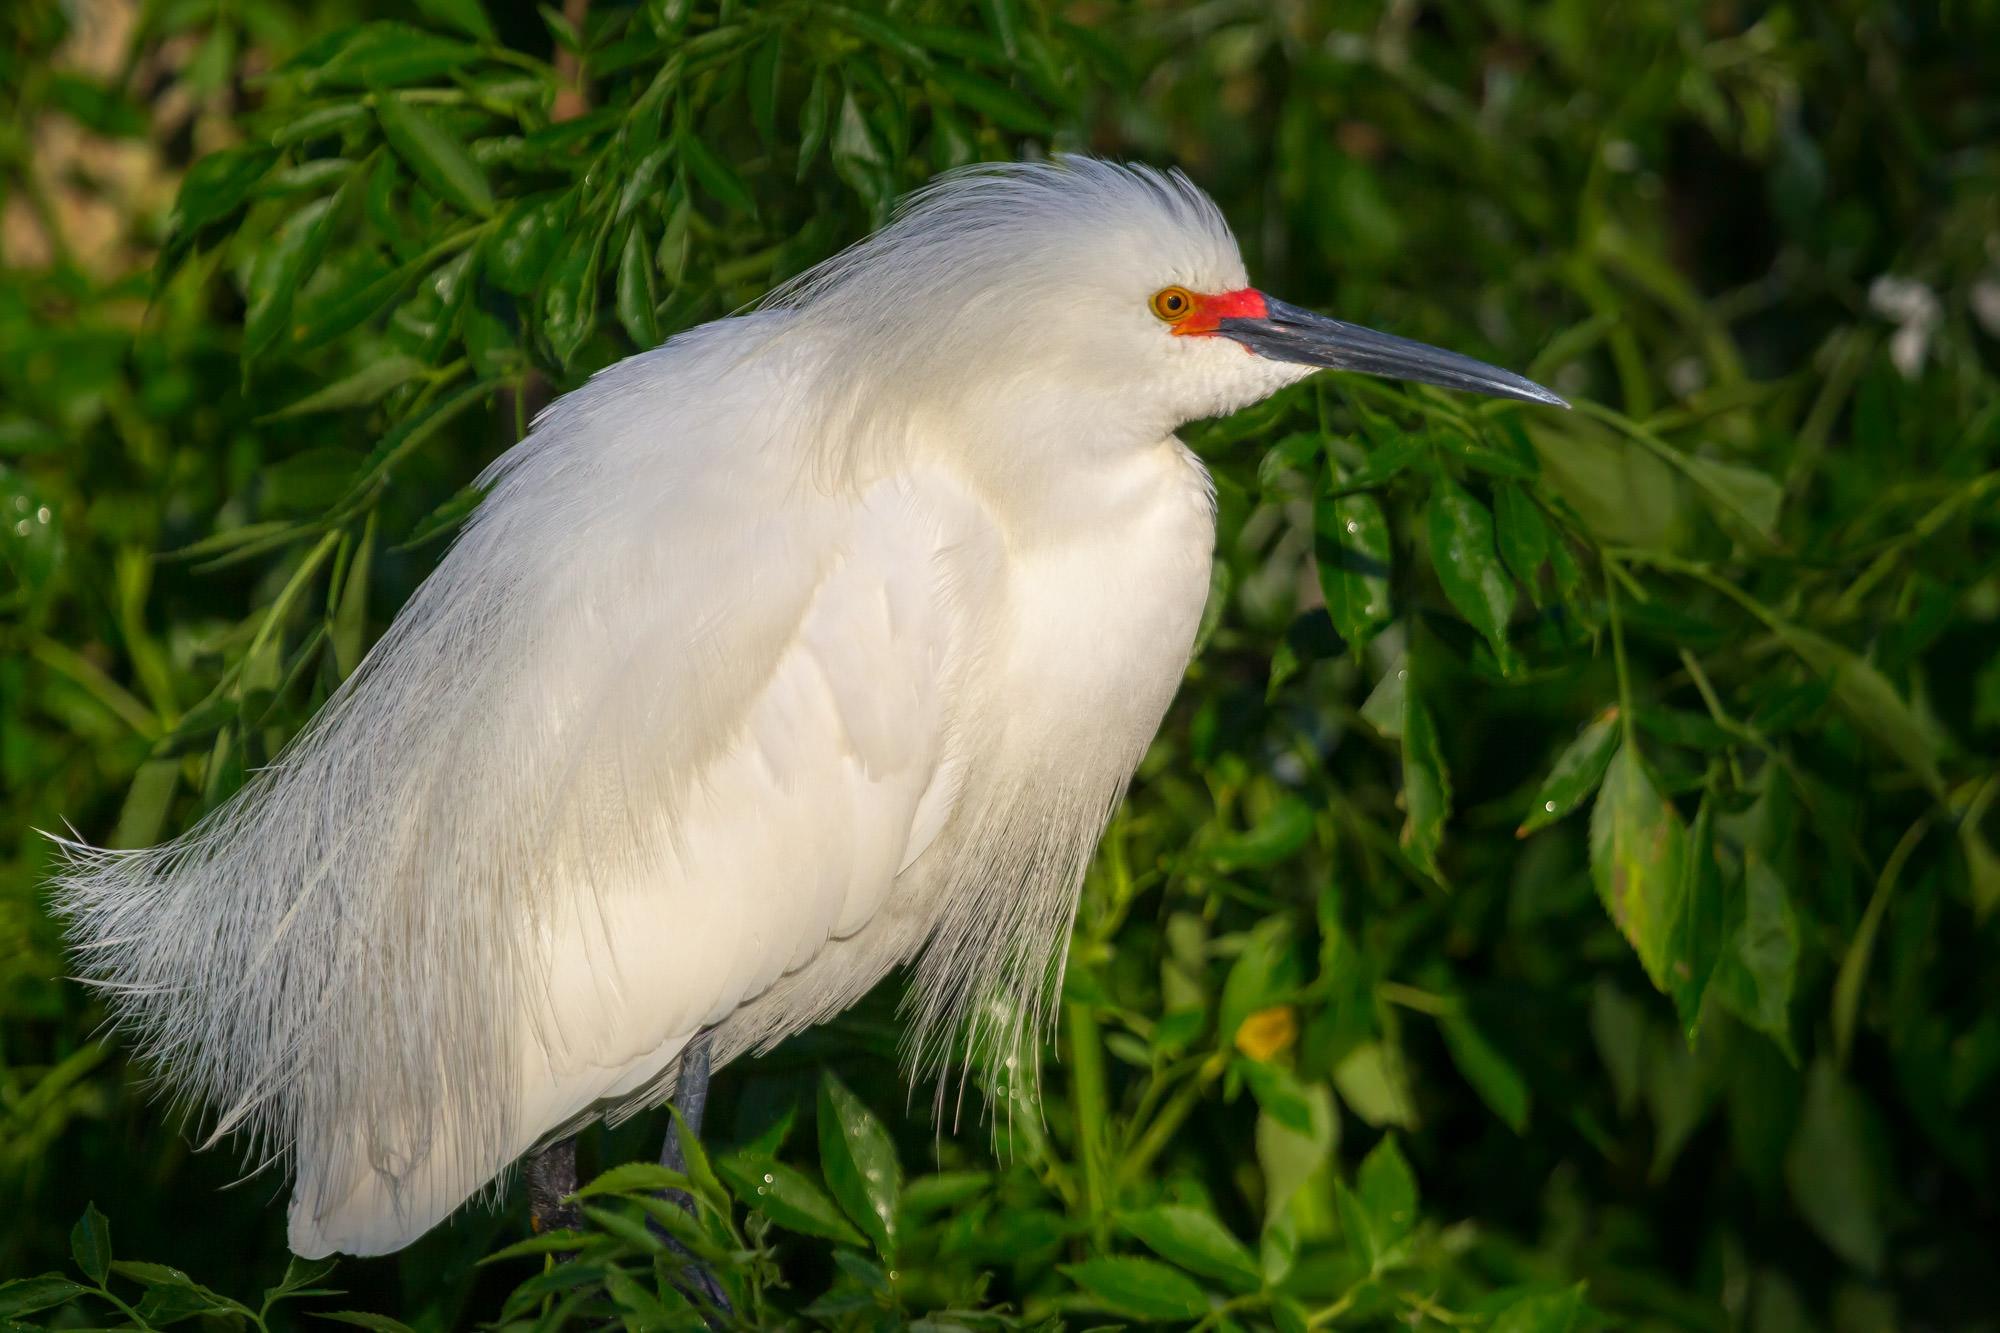 Egret, Snowy Egret, Florida, limited edition, photograph, fine art, wildlife, photo